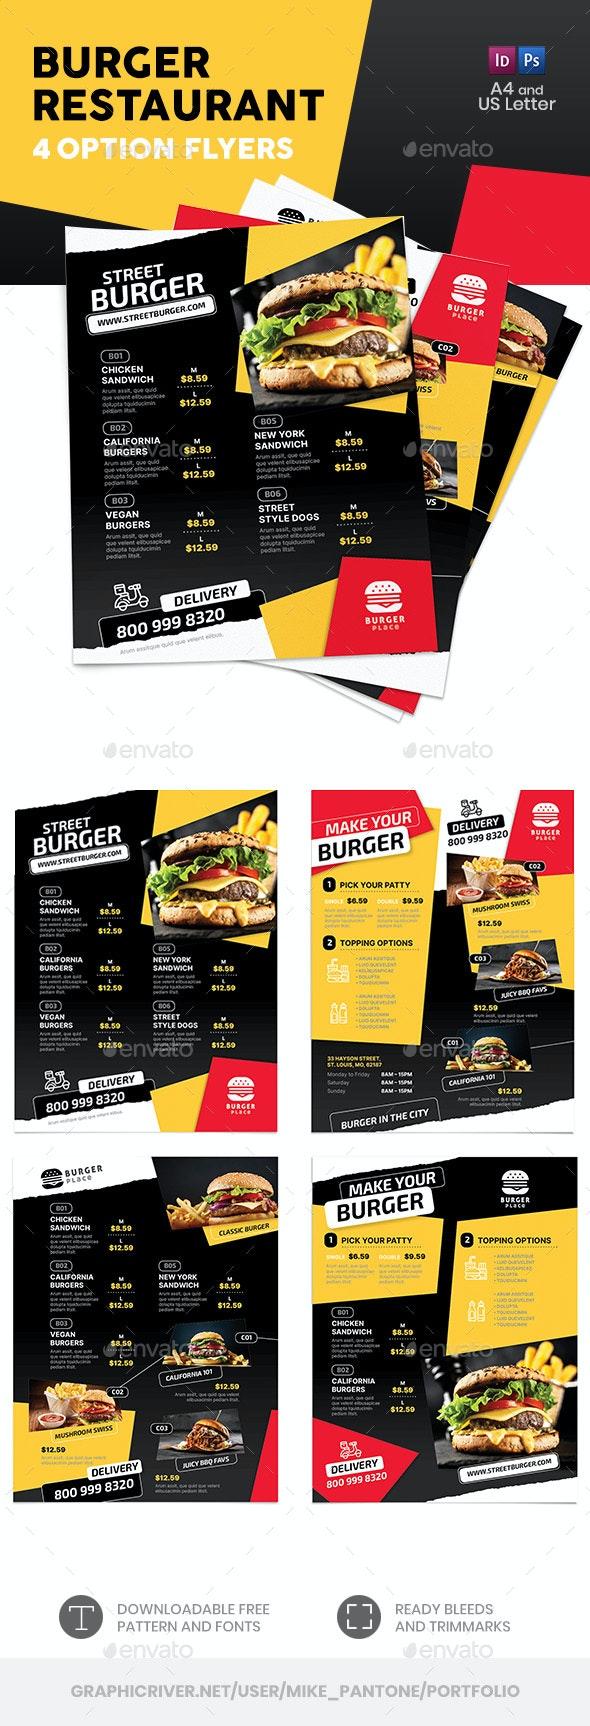 Burger Restaurant Flyers 2 – 4 Options - Food Menus Print Templates